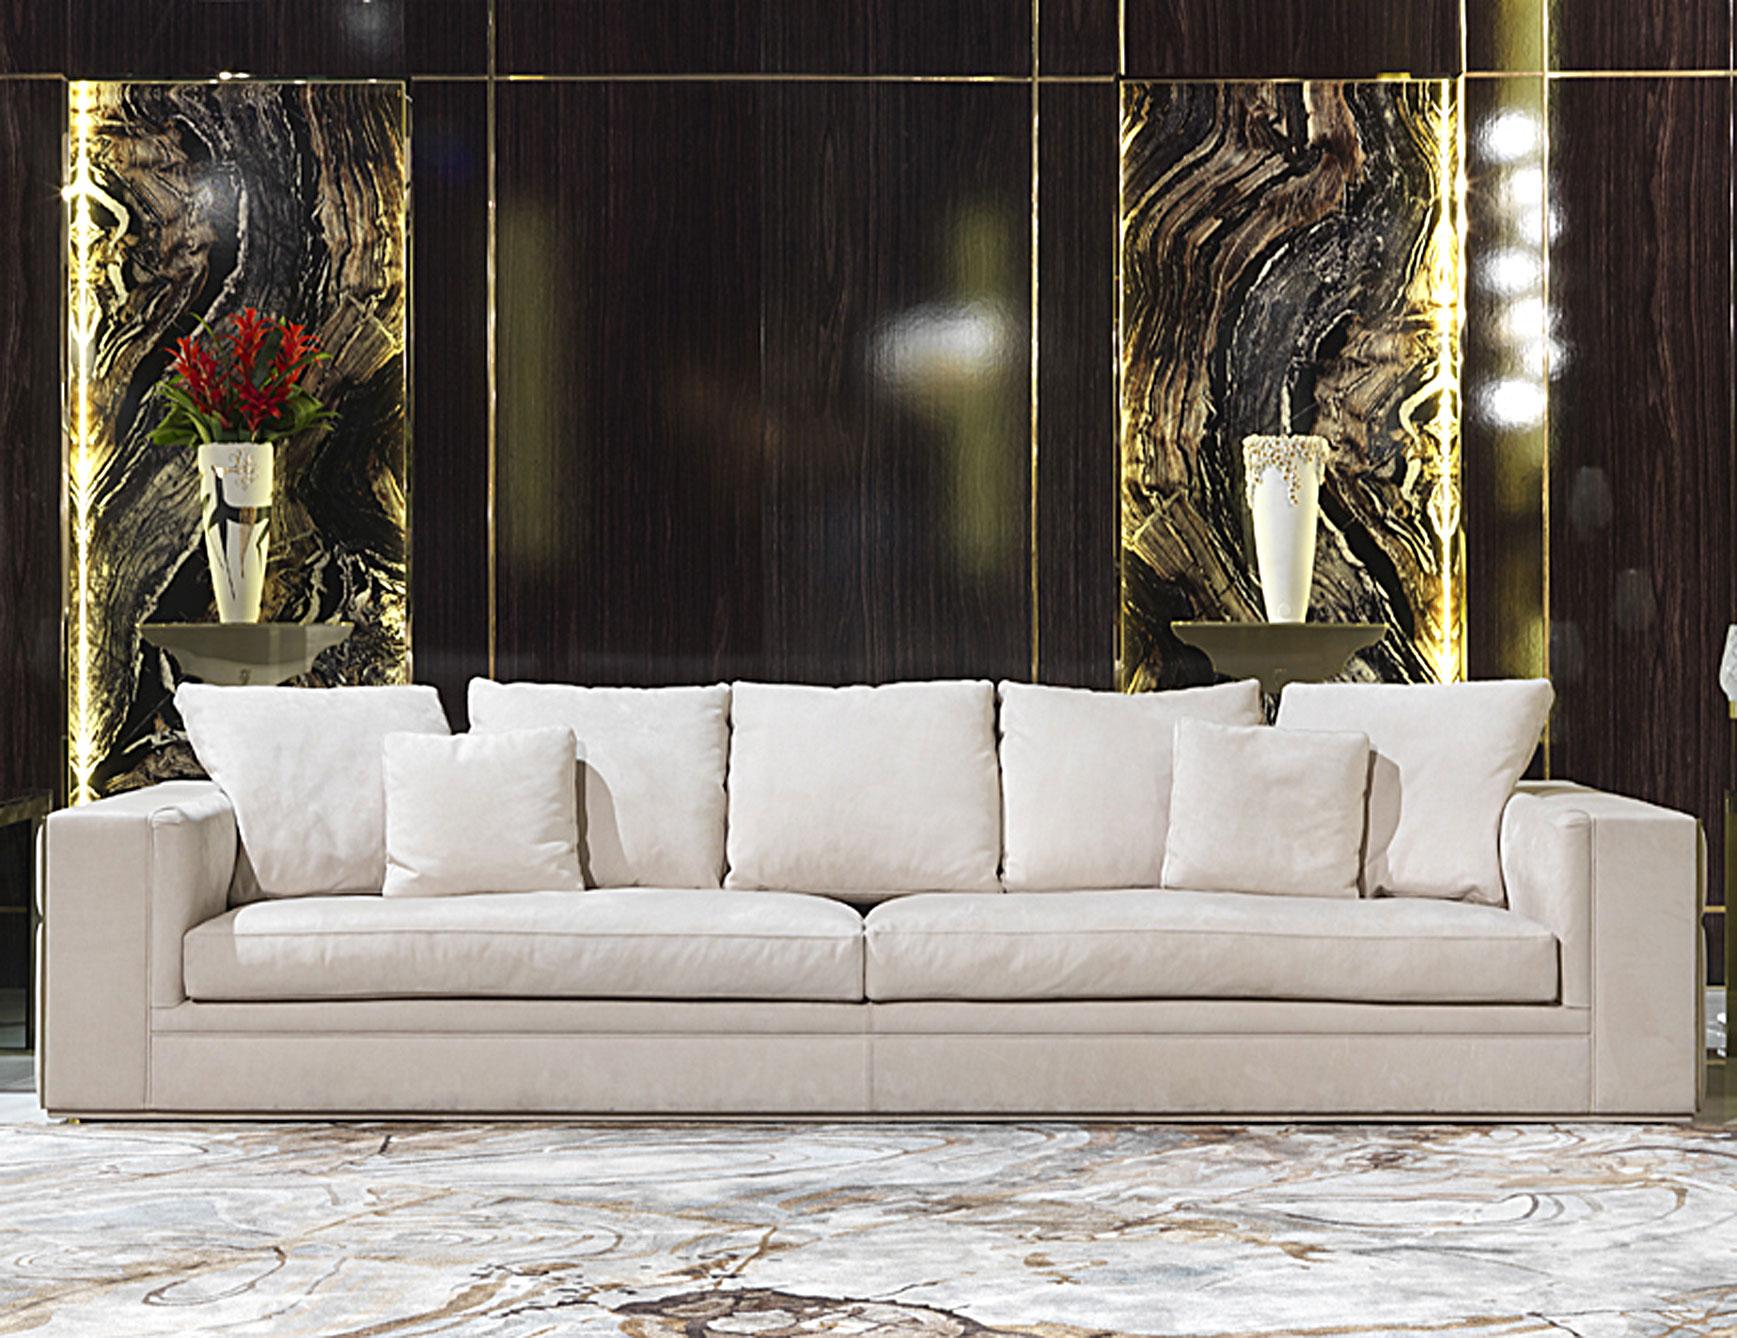 Luxury Sofa Beautiful Luxury Sofa Image 27610